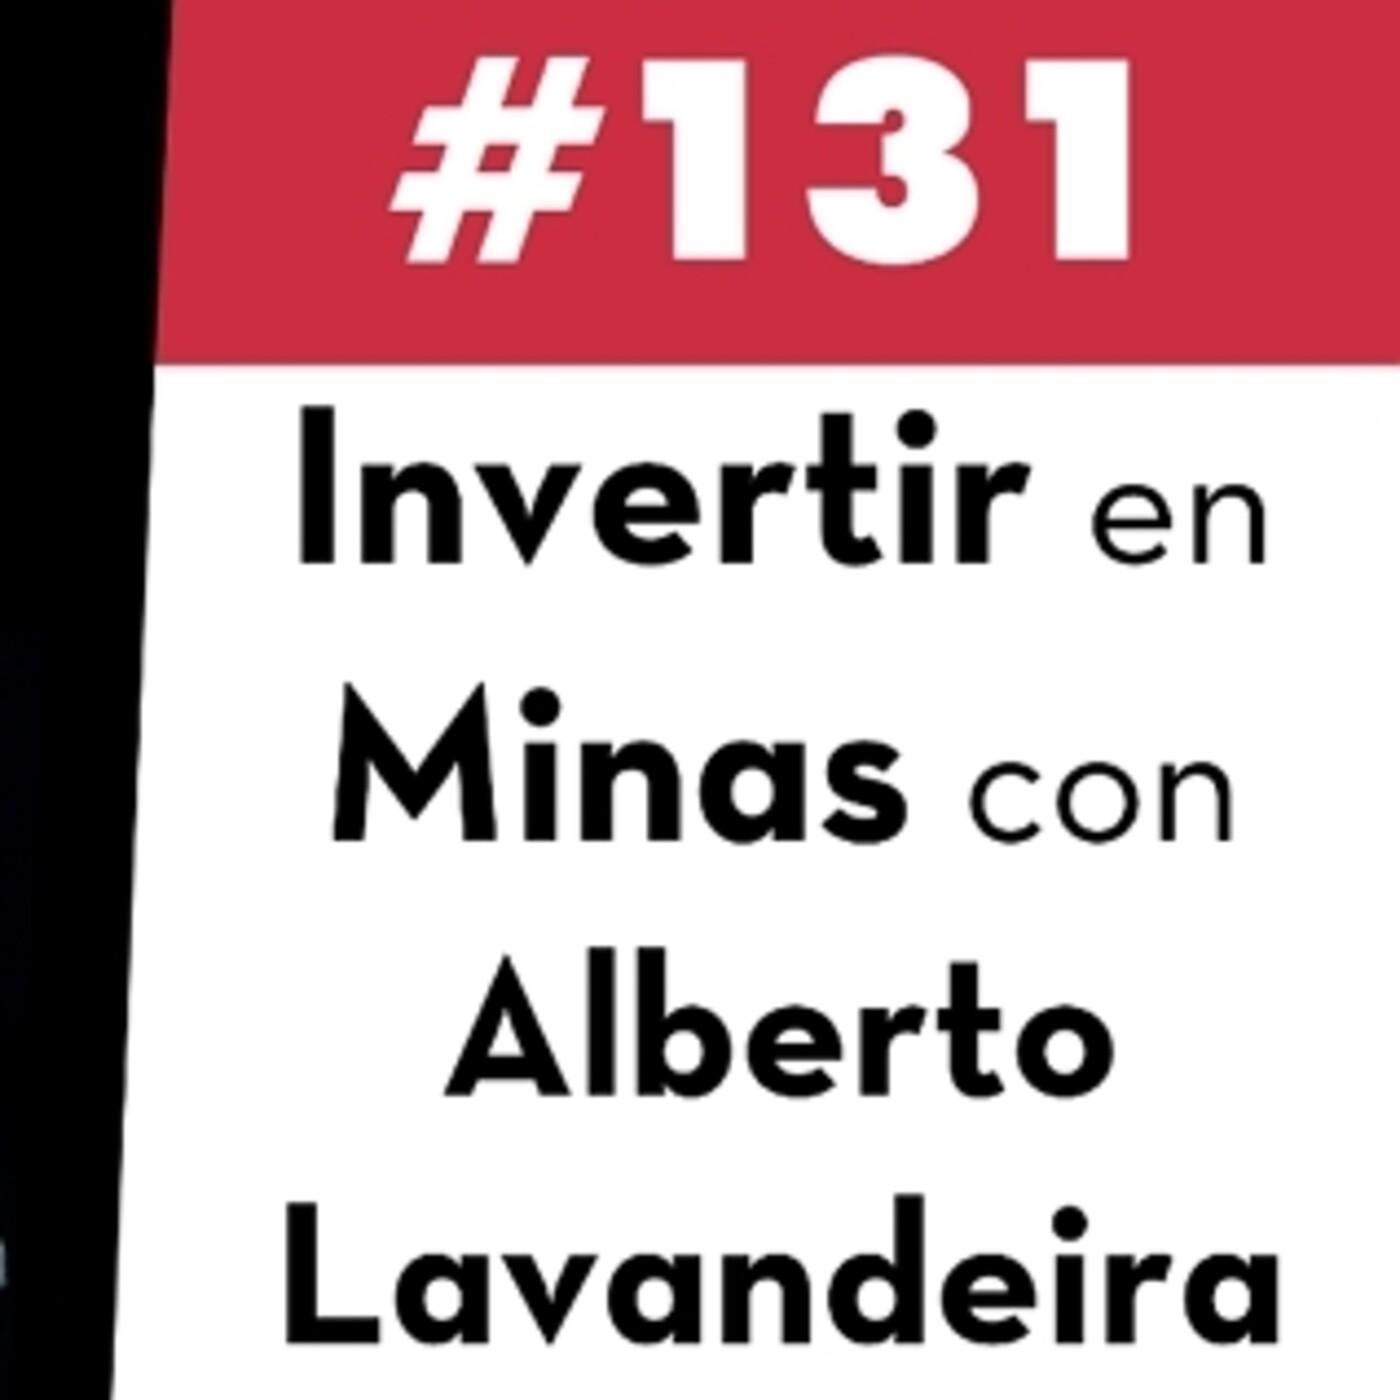 131. Invertir en Minas con Alberto Lavandeira